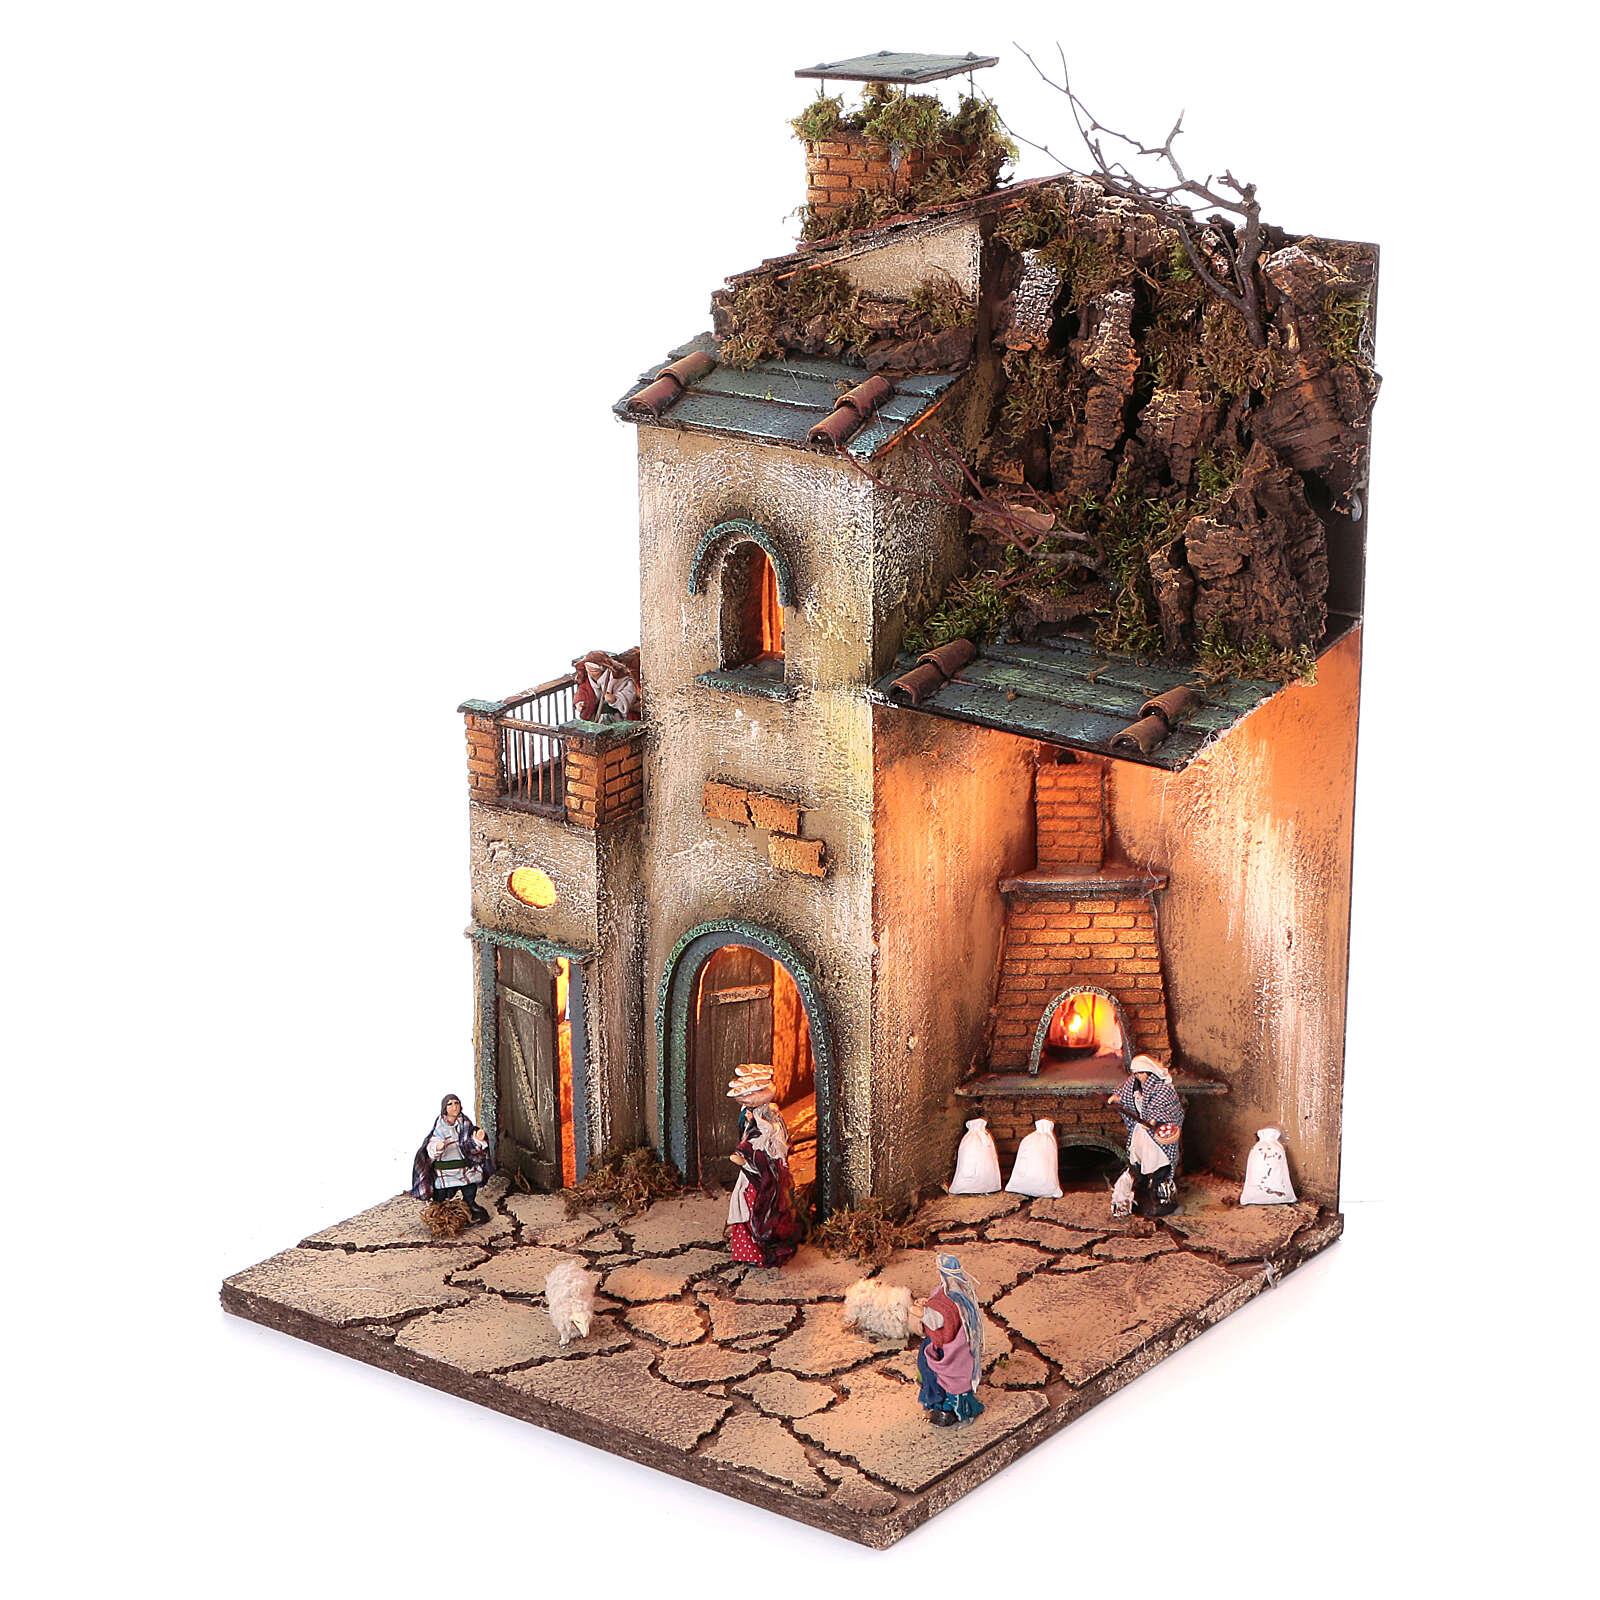 Neapolitan nativity village 8 cm figures with oven 55x40x40 module 4 4